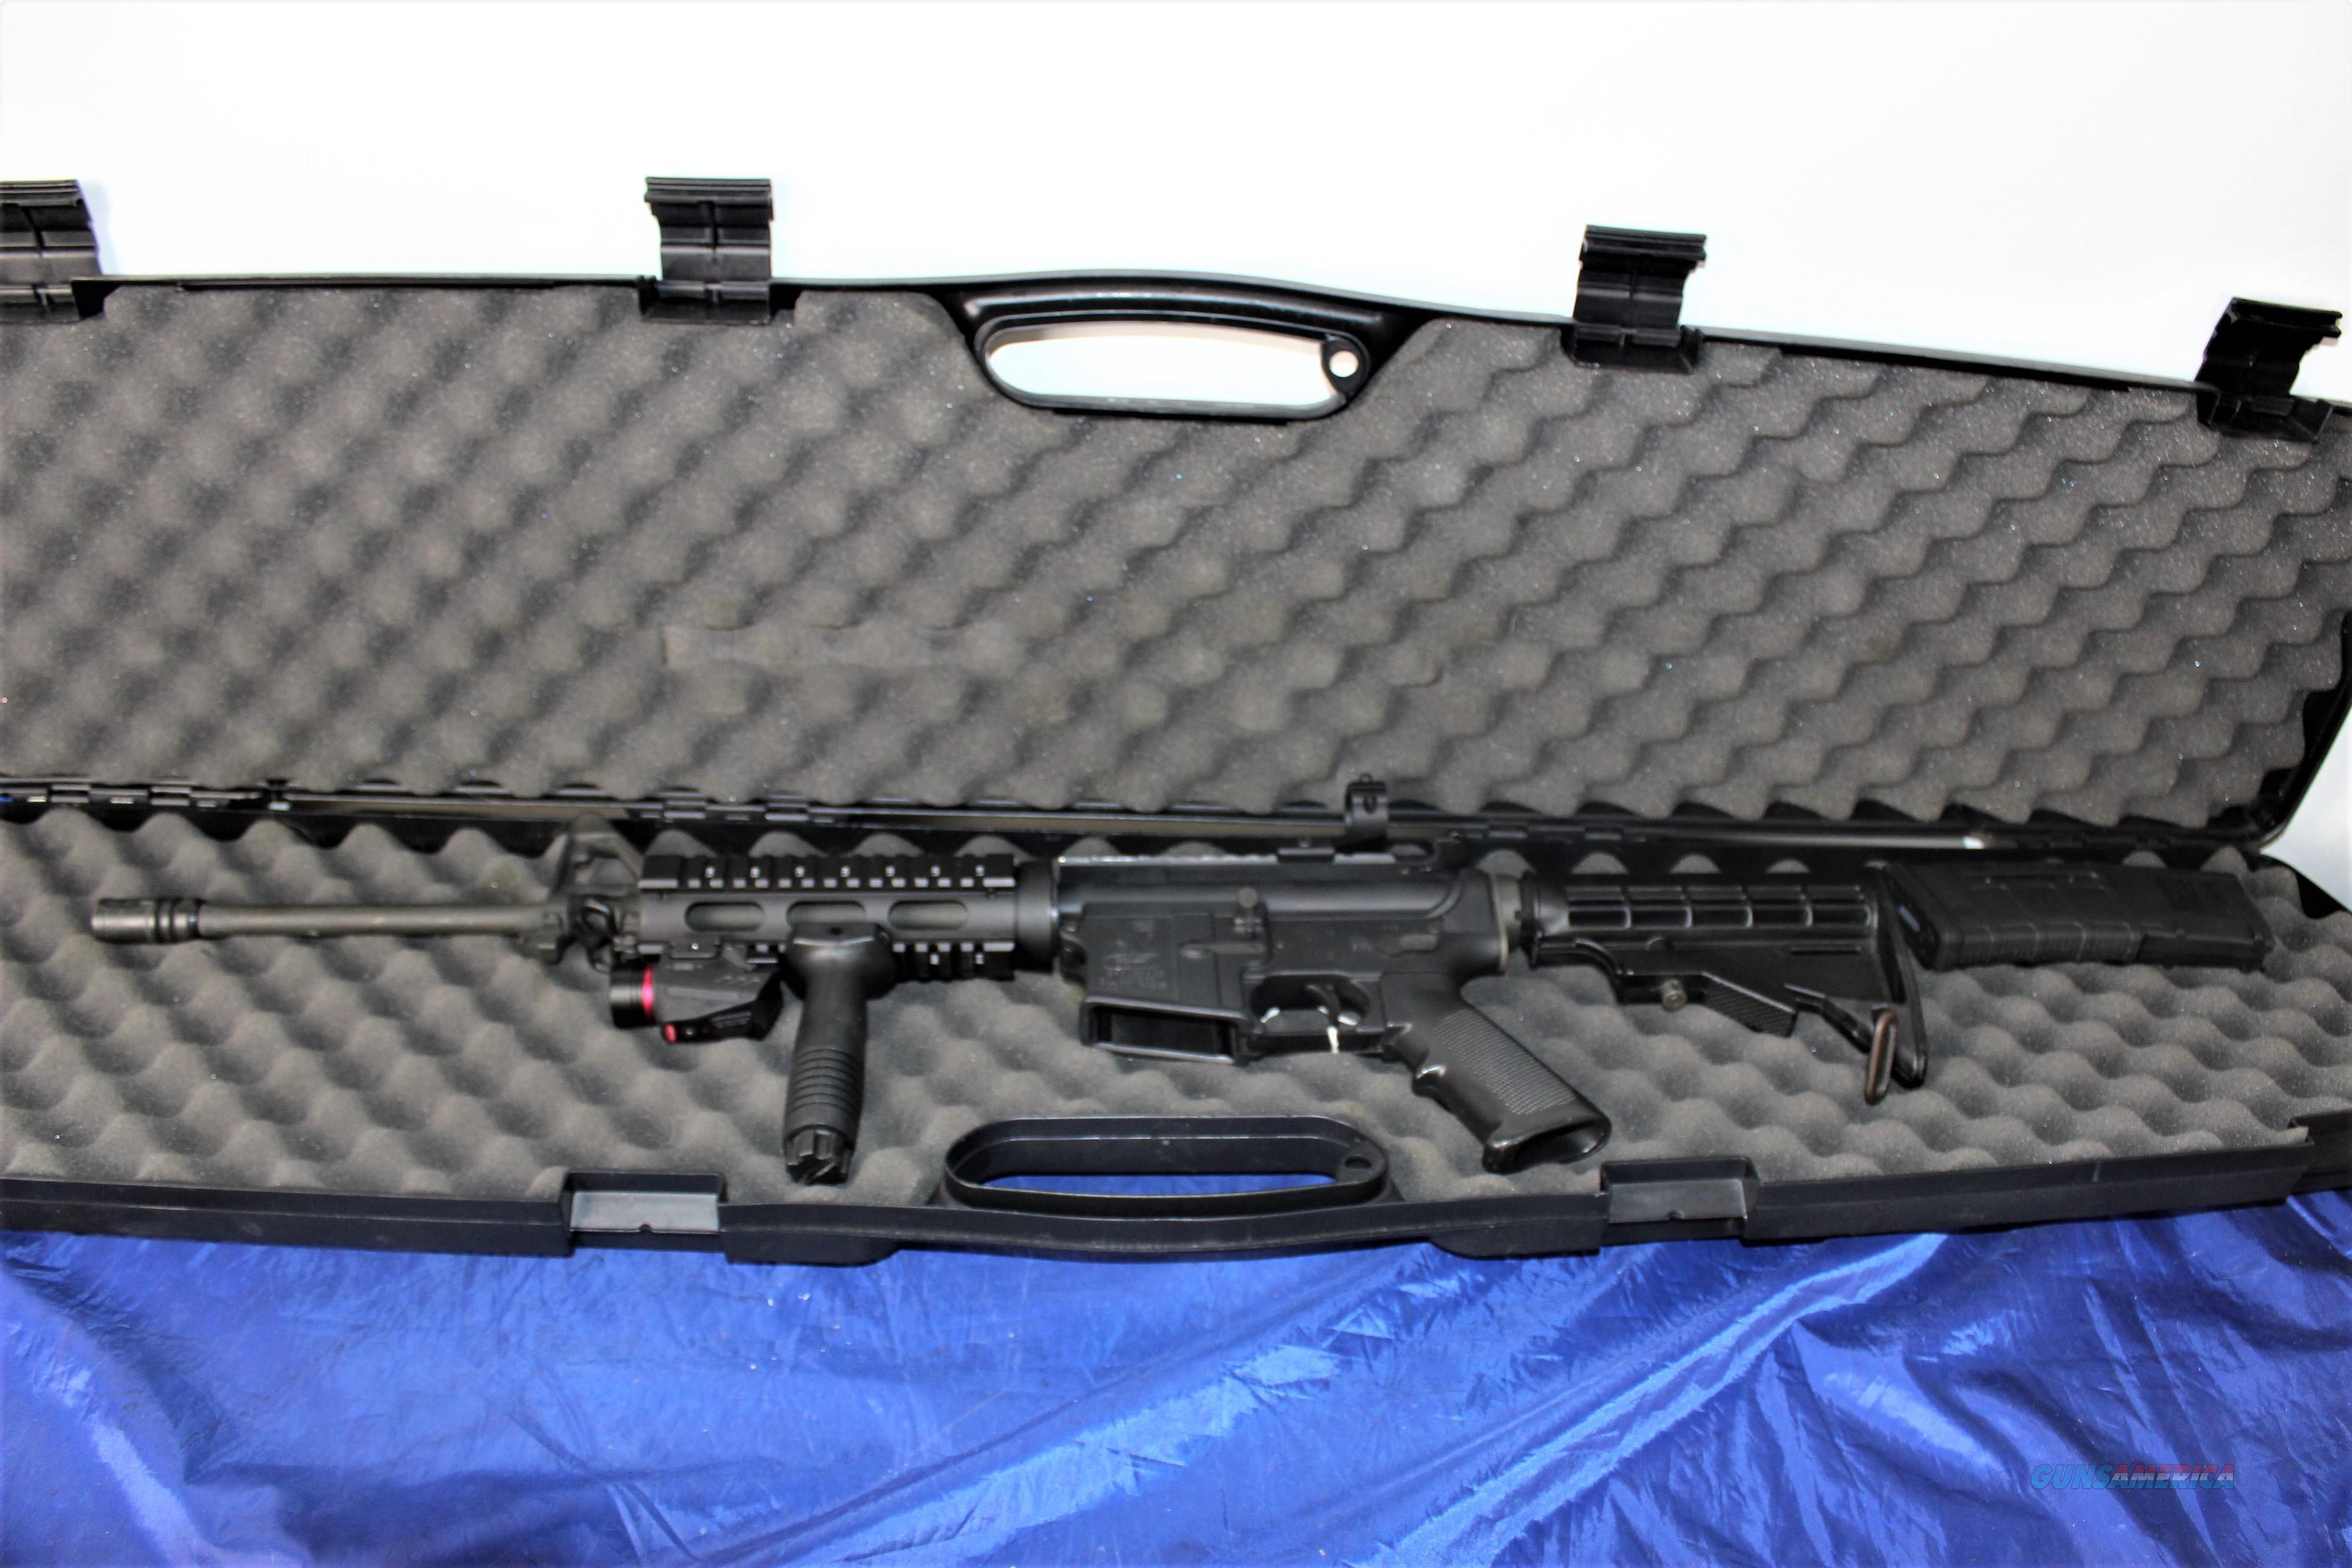 Bushmaster XM15-E2S 5.56mm Patrolmans Carbine  Guns > Rifles > Bushmaster Rifles > Complete Rifles